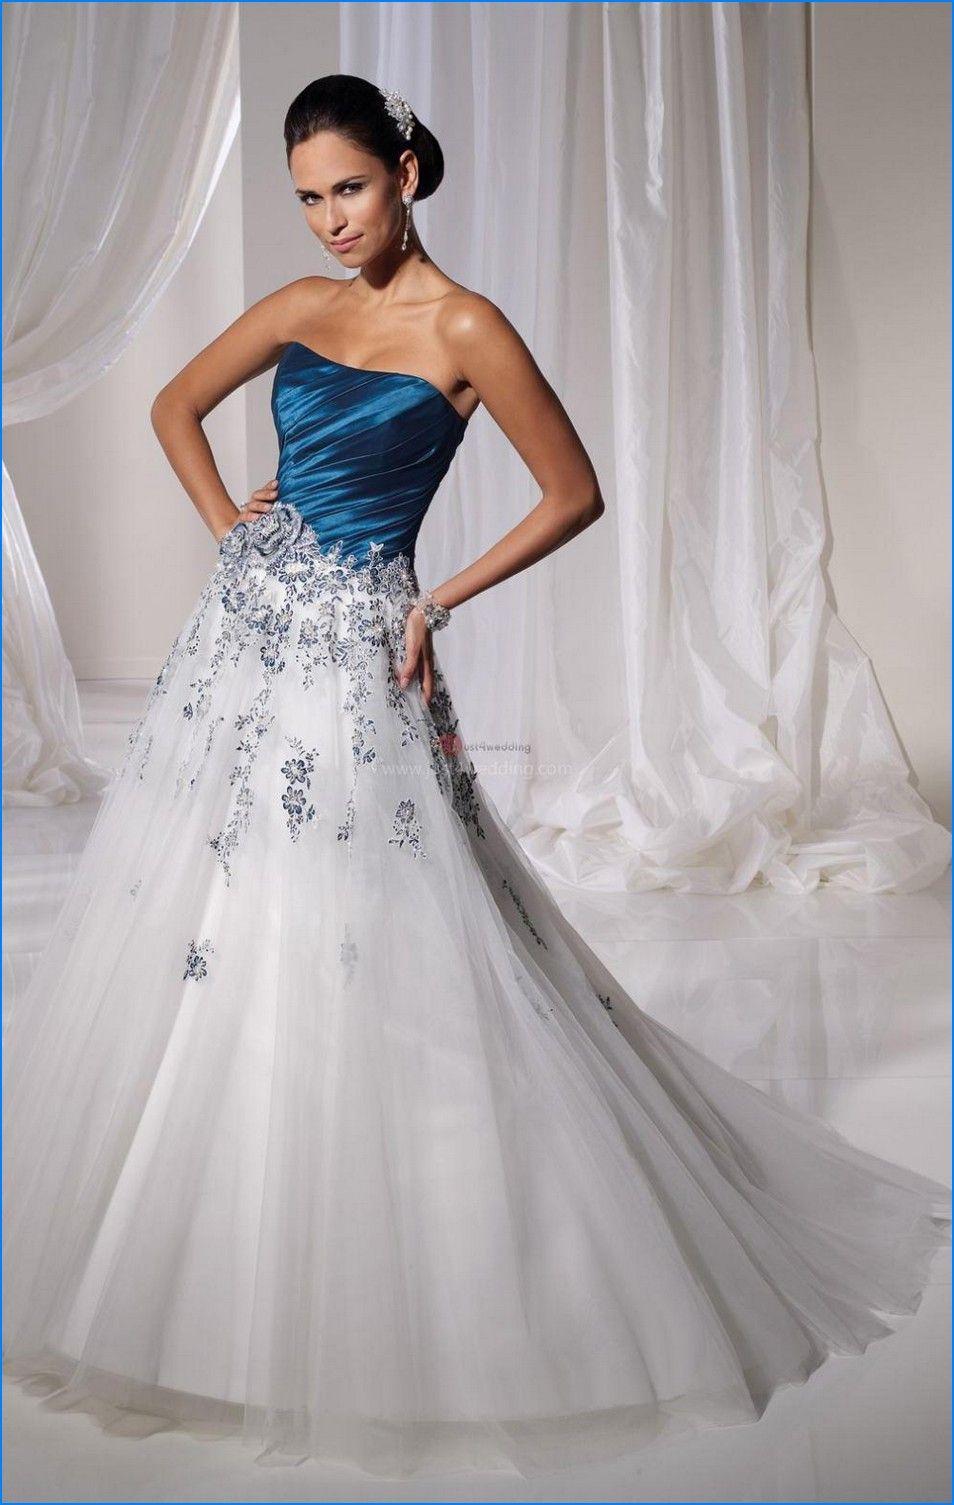 Ice Blue and Silver Bridesmaid Dresses Idea – Top Fashion ...